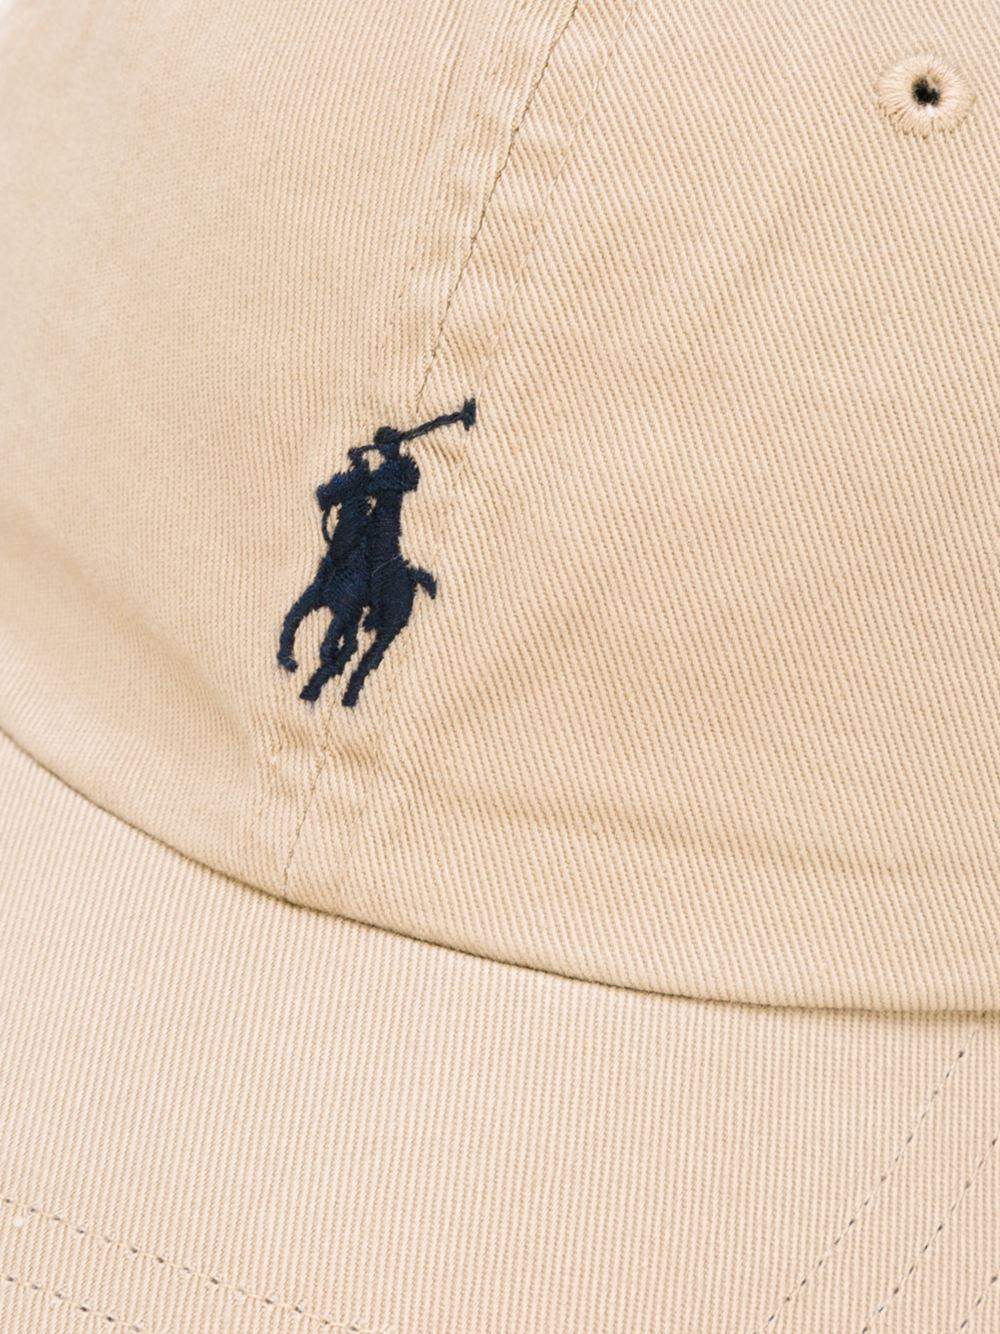 Embroidered Polo Cap Lauren In For Logo Ralph Natural Baseball Men 8vmN0nw